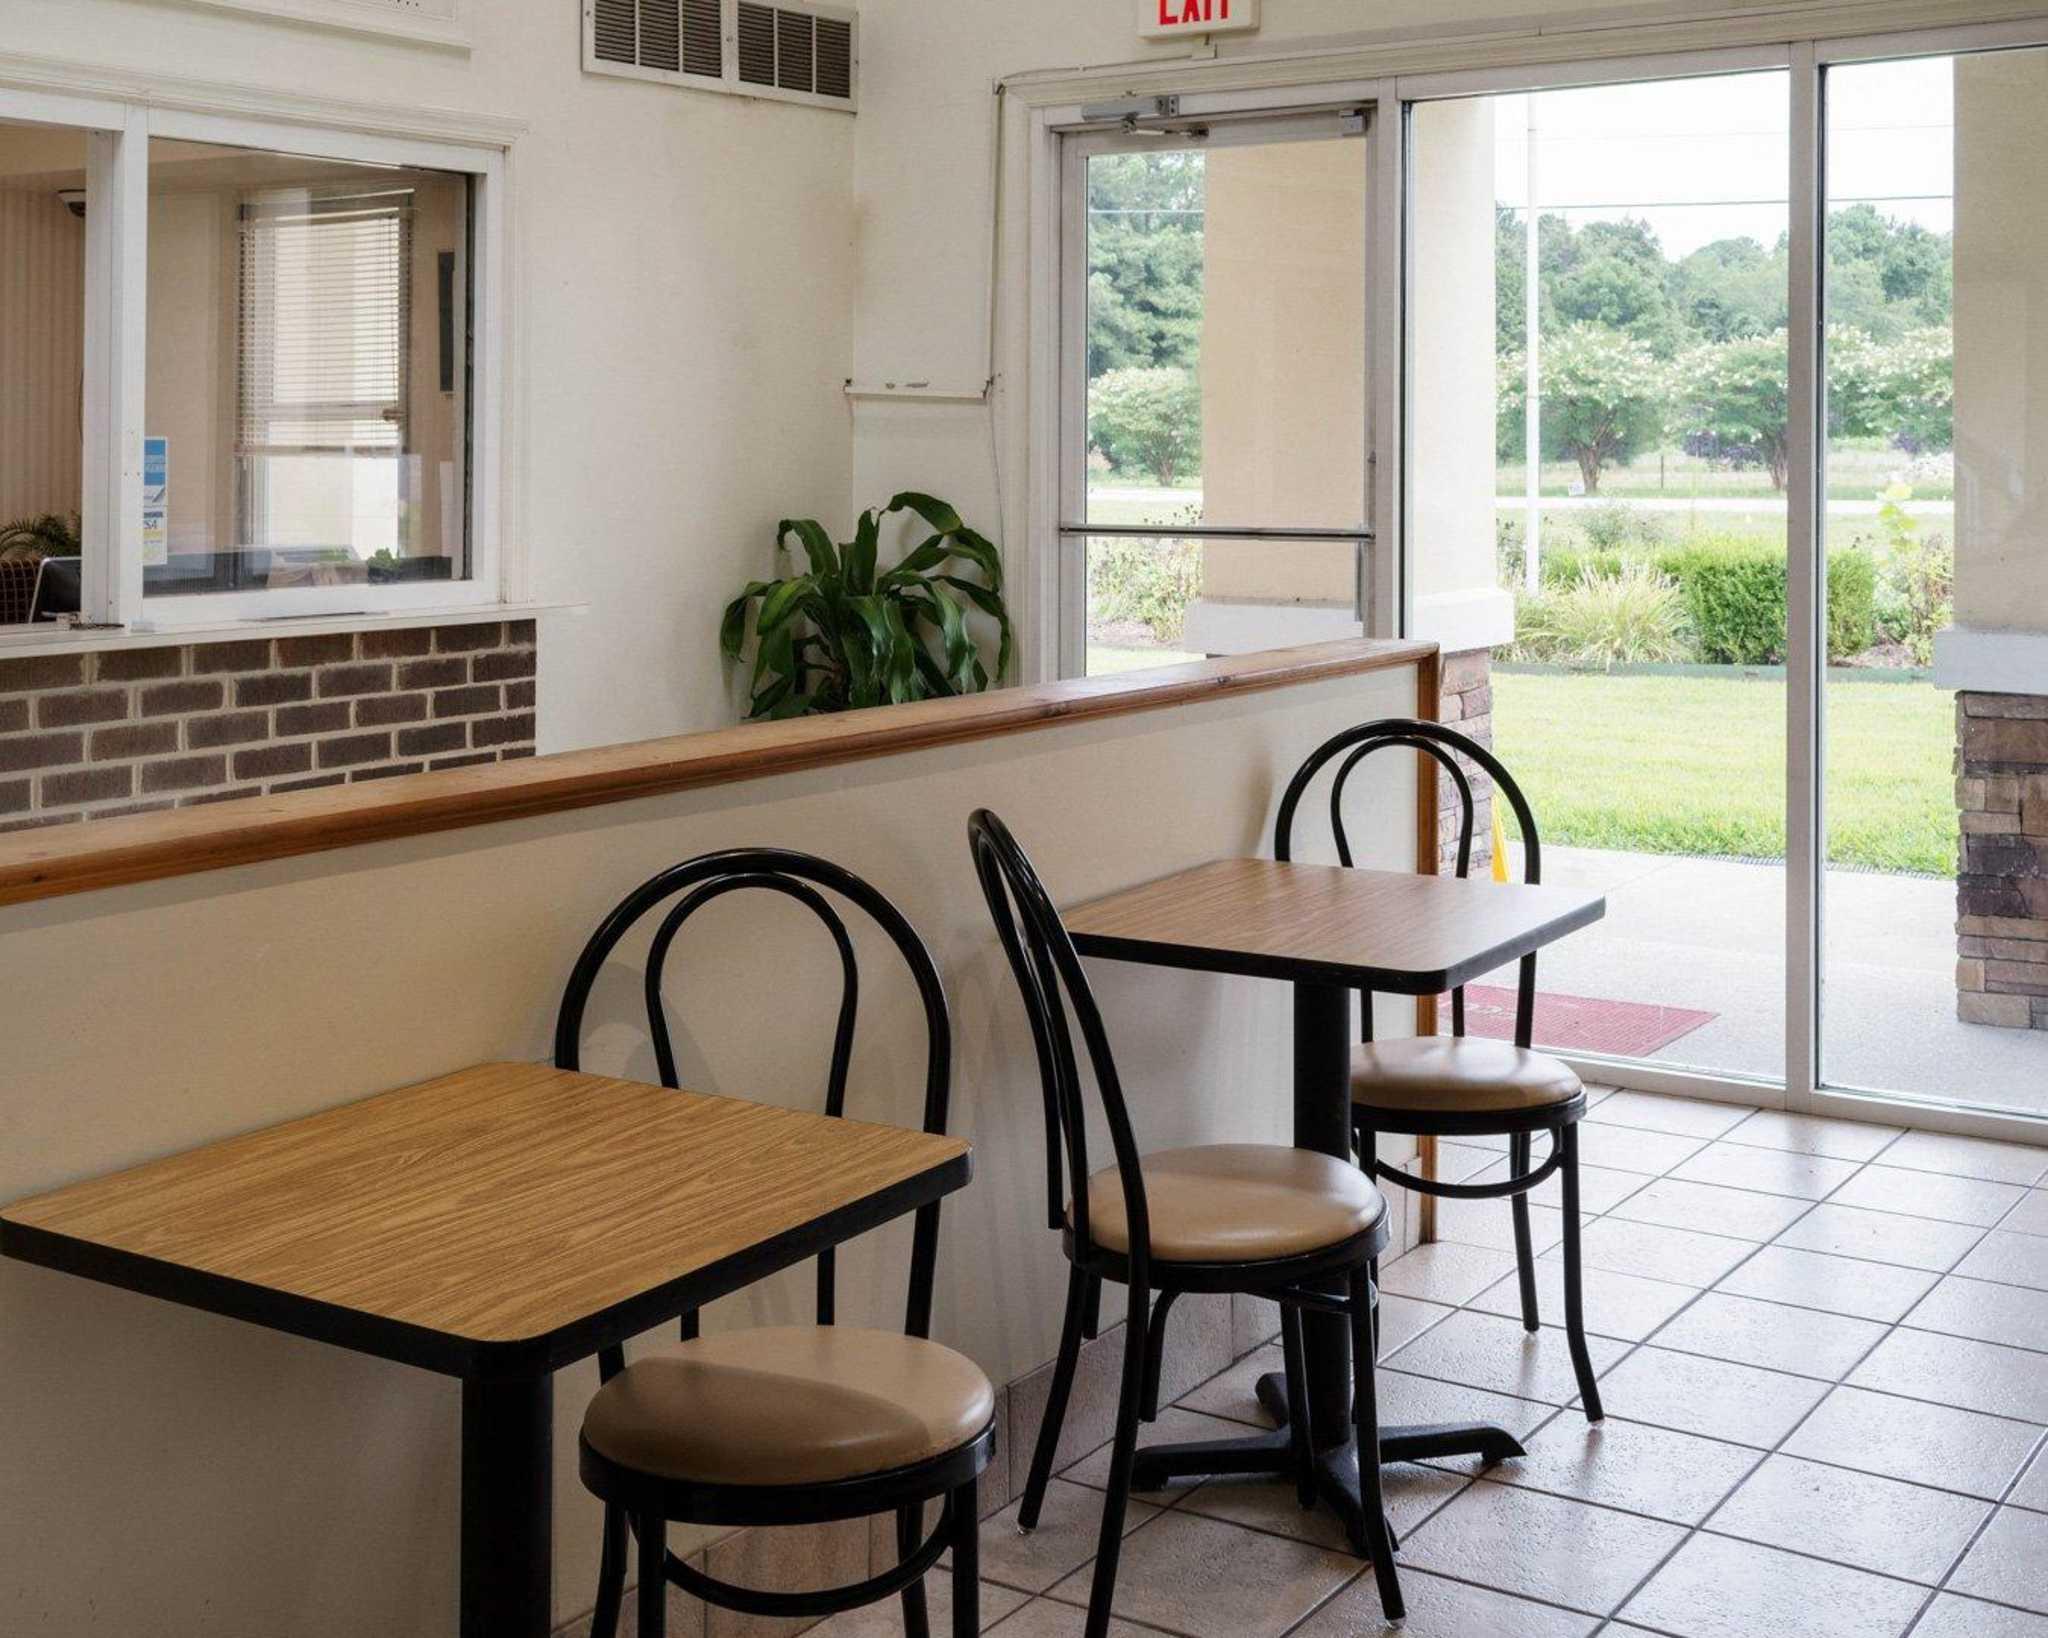 Econo Lodge Inn & Suites Carrollton Smithfield image 17